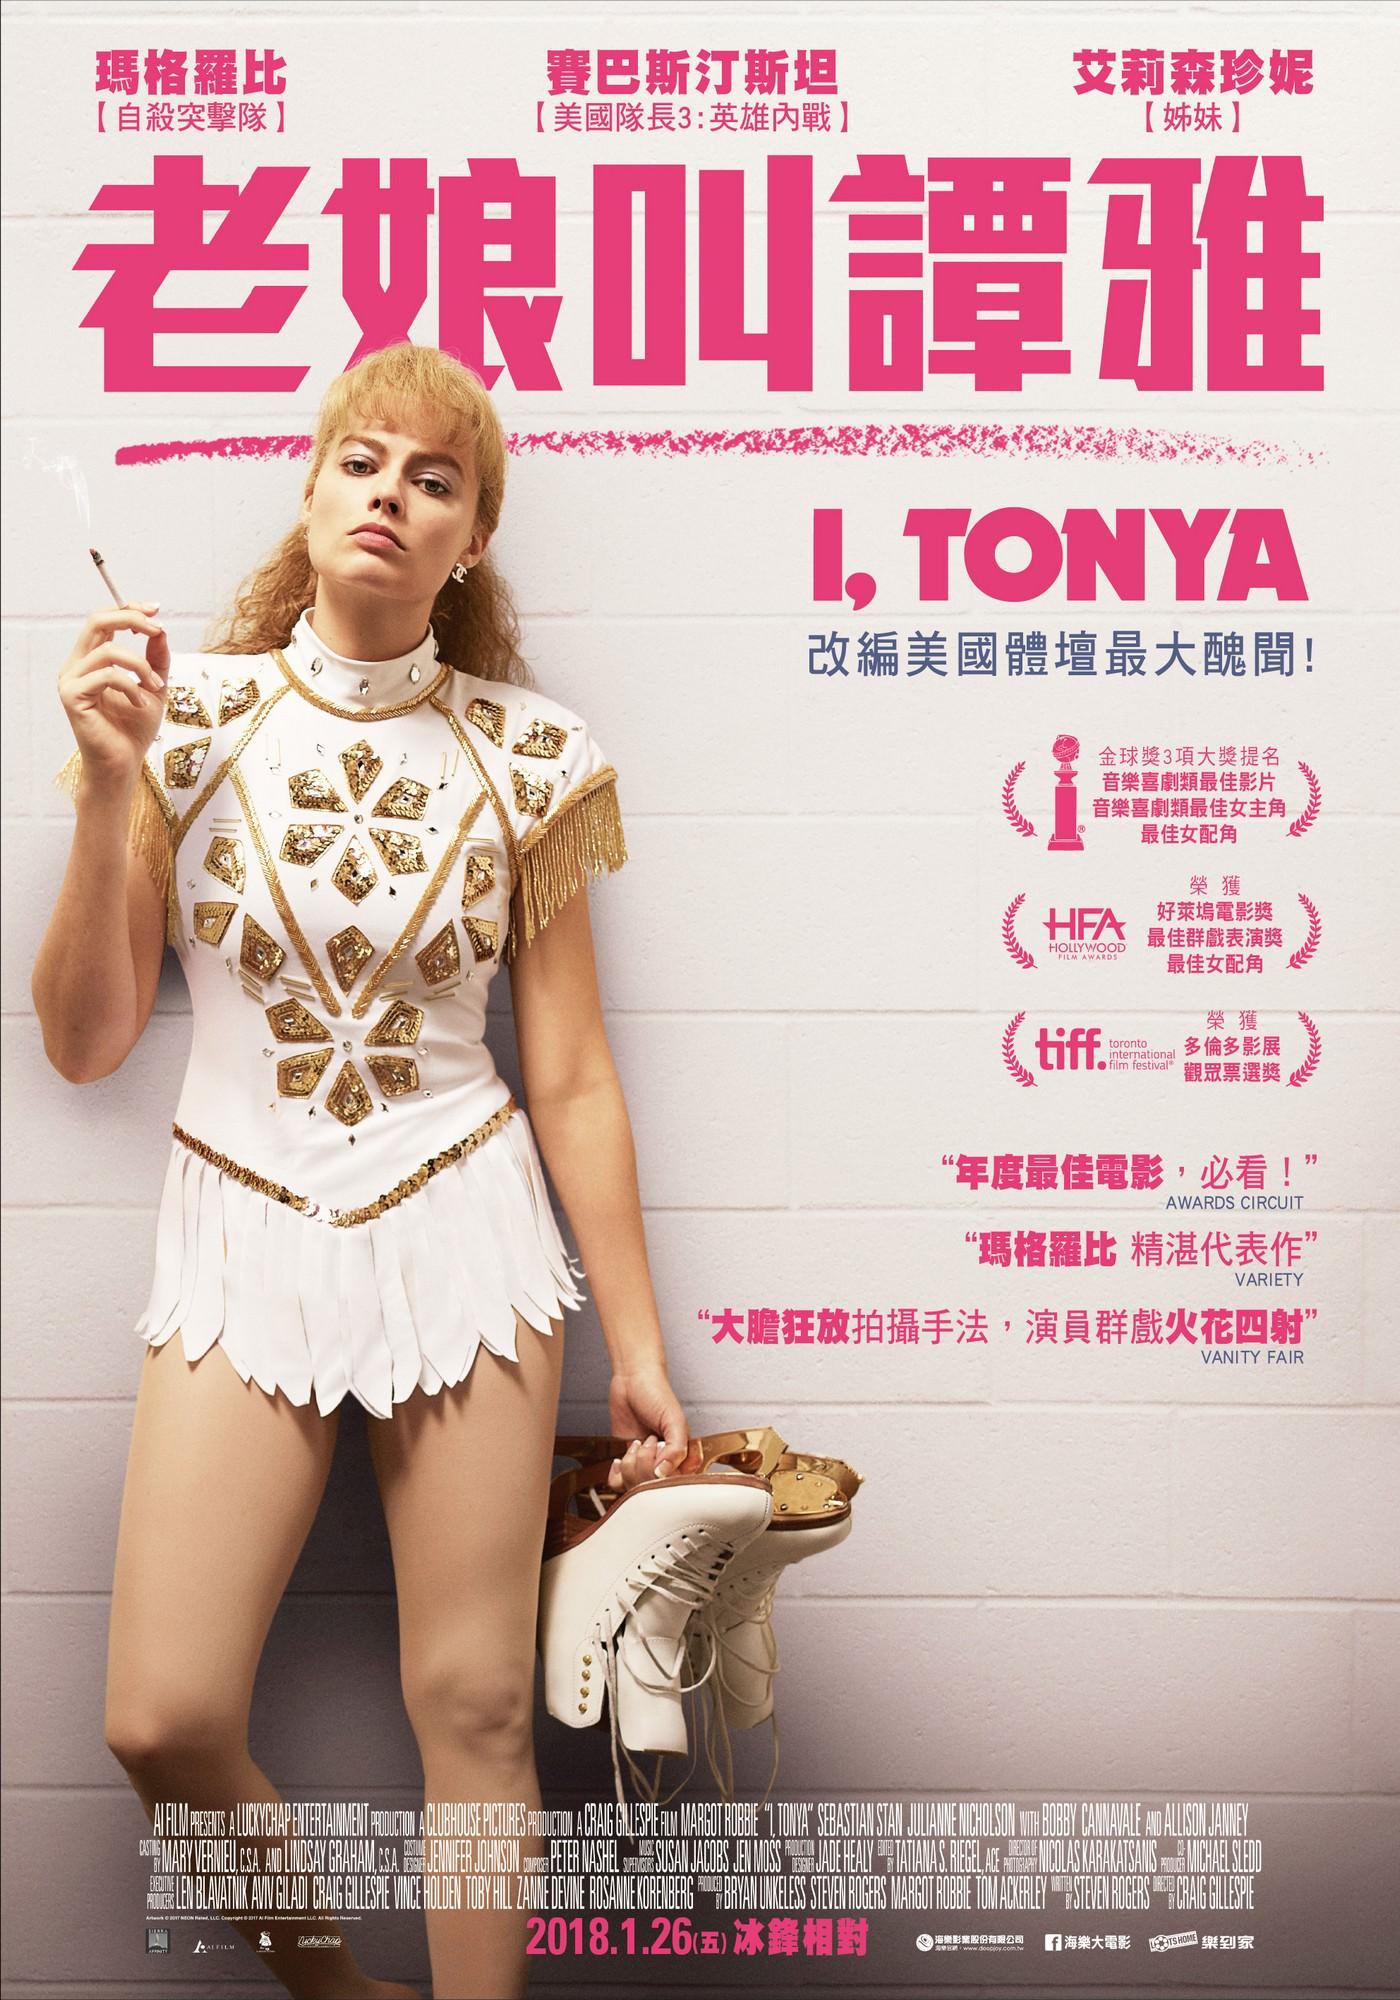 Movie, I, Tonya(美國) / 老娘叫譚雅(台) / 冰之驕女(港) / 我,花样女王, 電影海報, 台灣